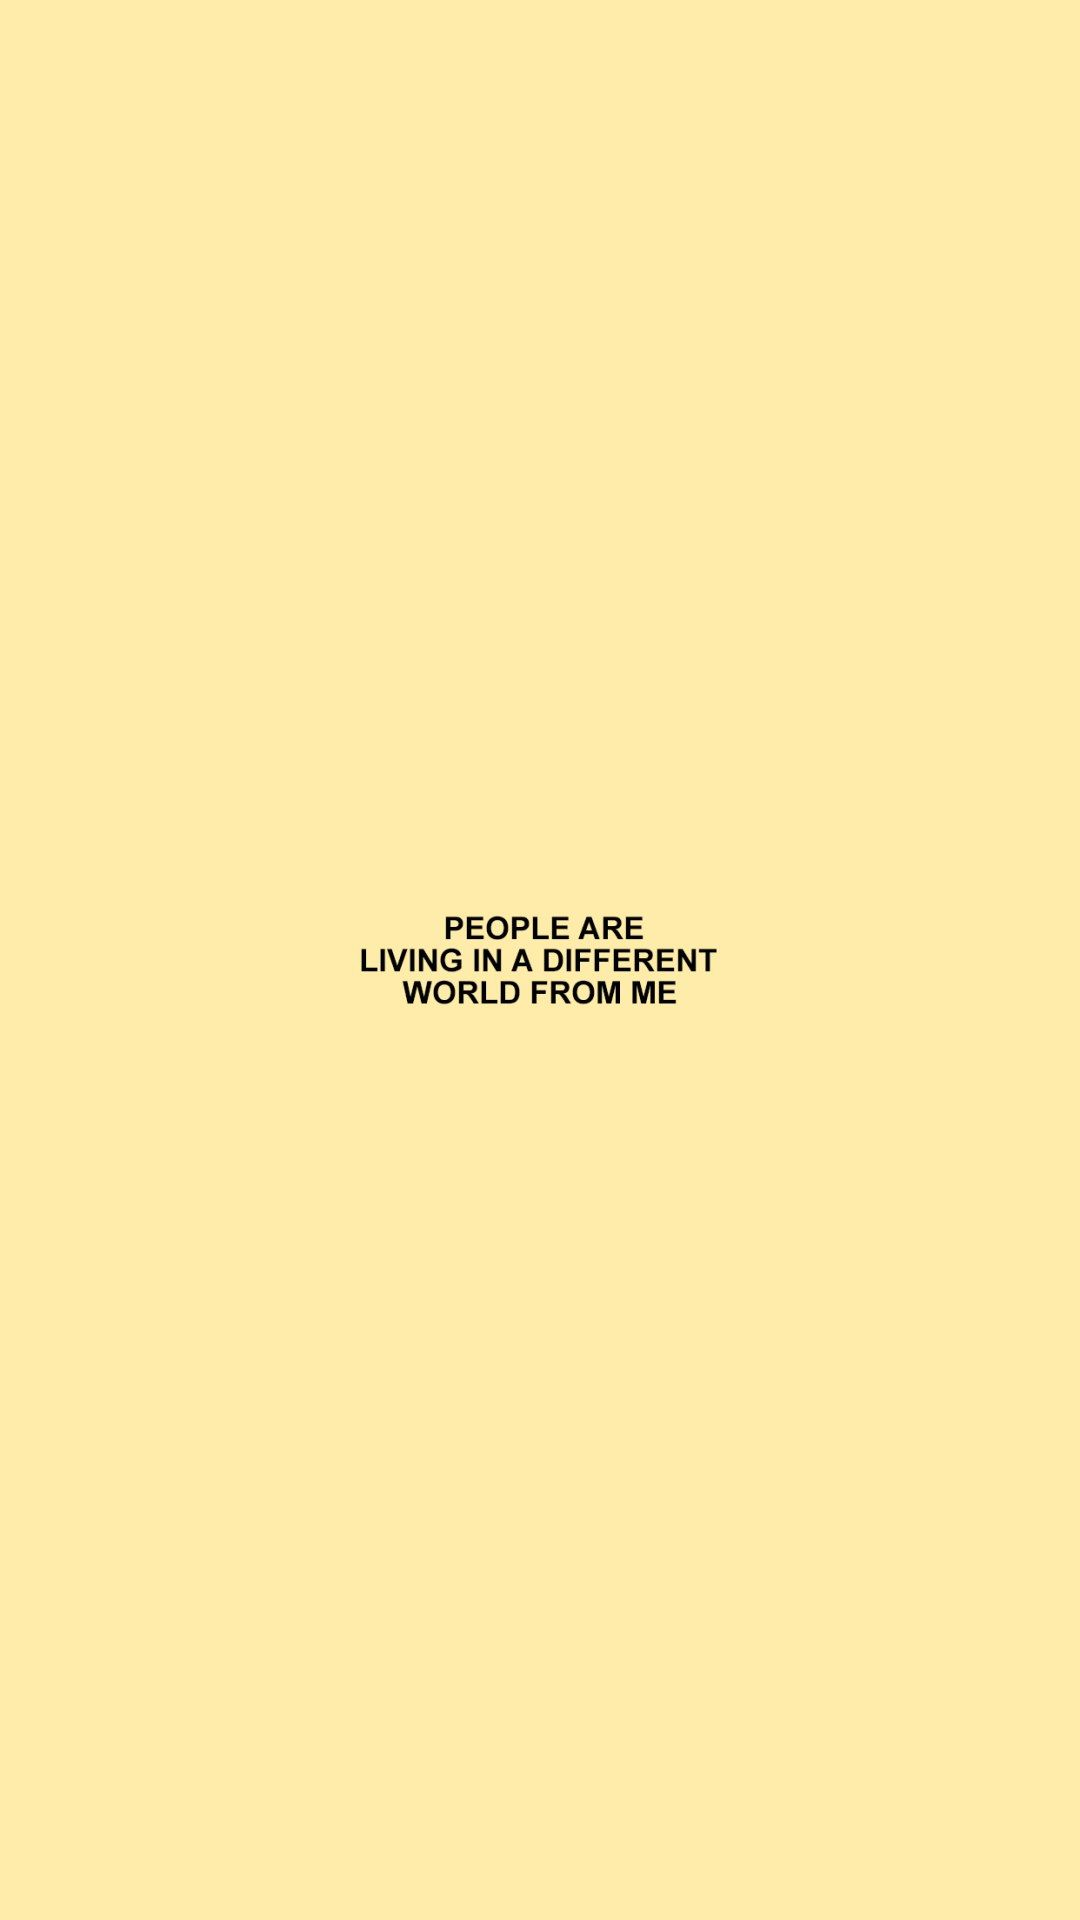 Aesthetic Yellow Text In 2020 Aesthetic Desktop Wallpaper Quote Aesthetic Yellow Aesthetic